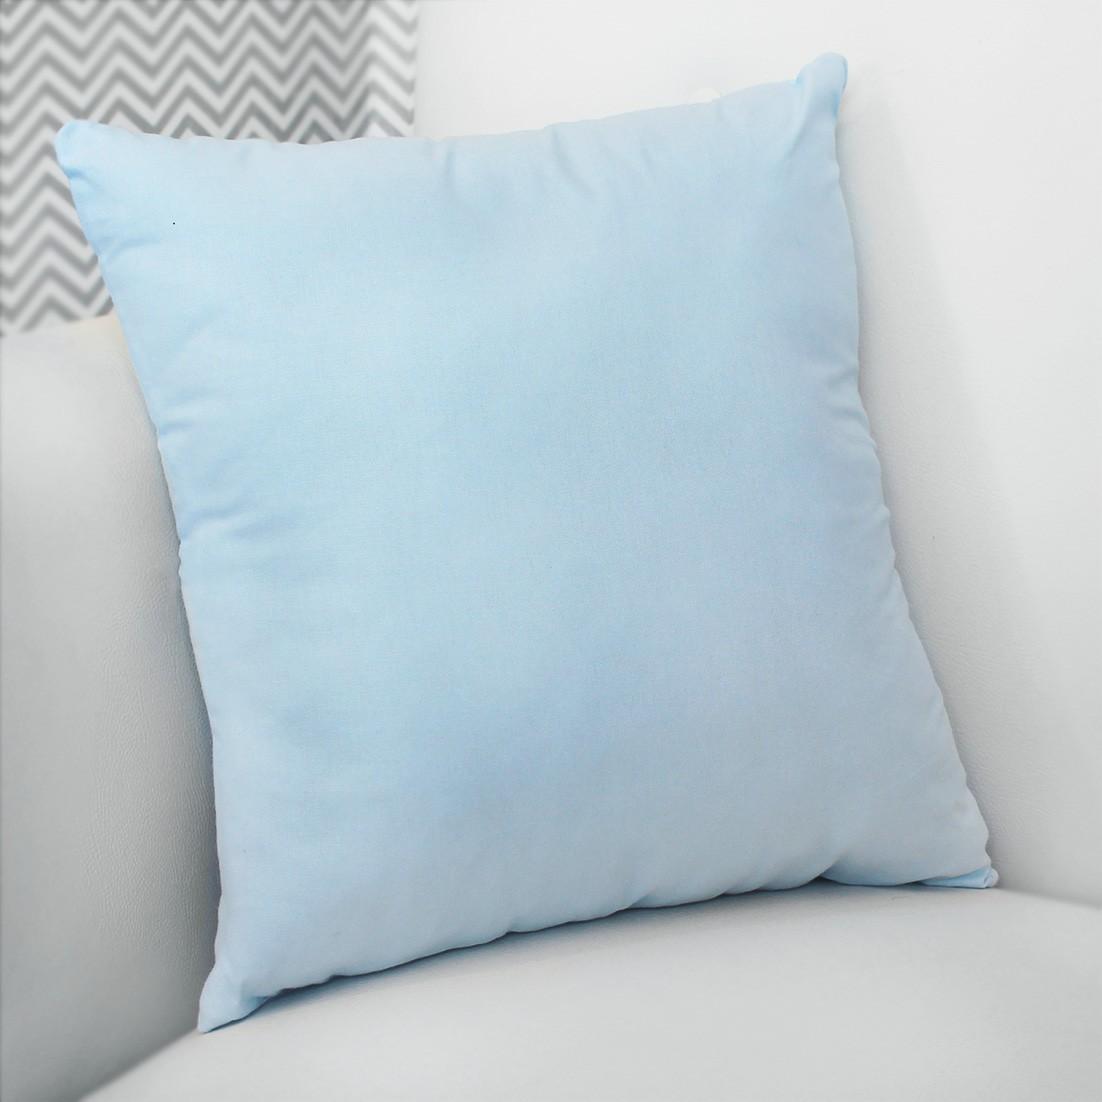 Almofada Decorativa Estampada -  Azul